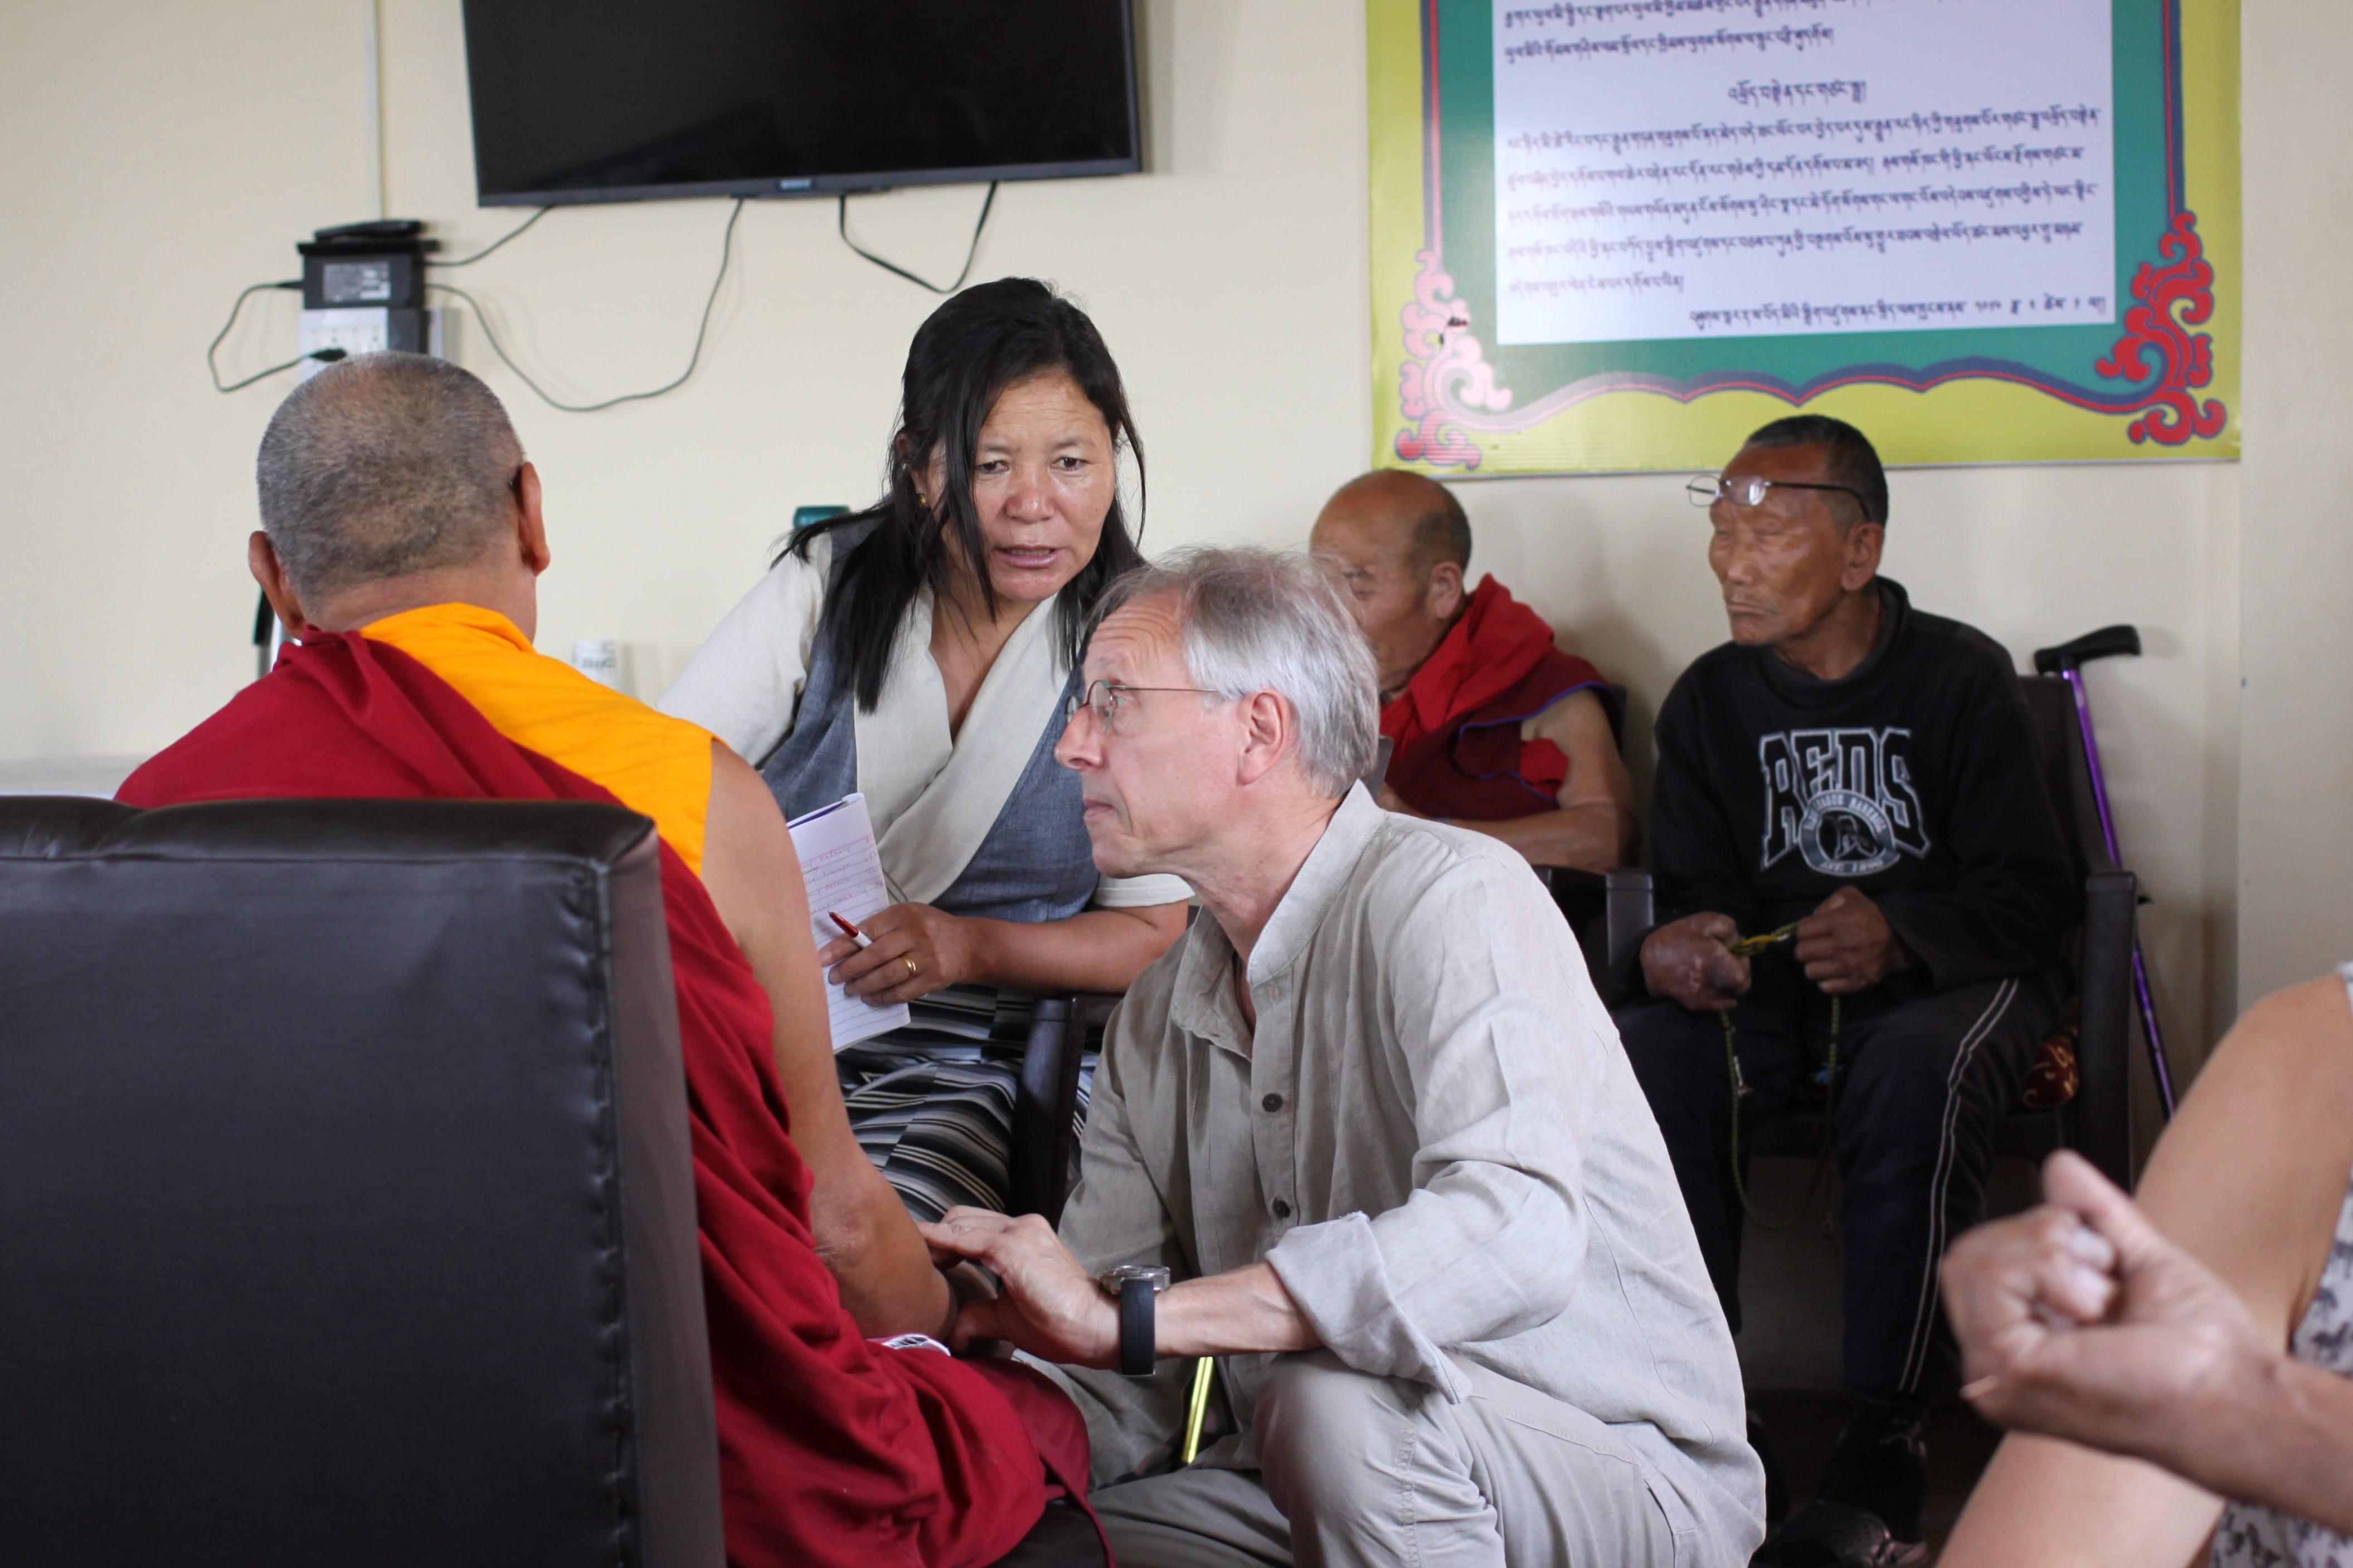 Buddhist monk being seen by doctor; image by Delfynn Aldag, via Unsplash.com.